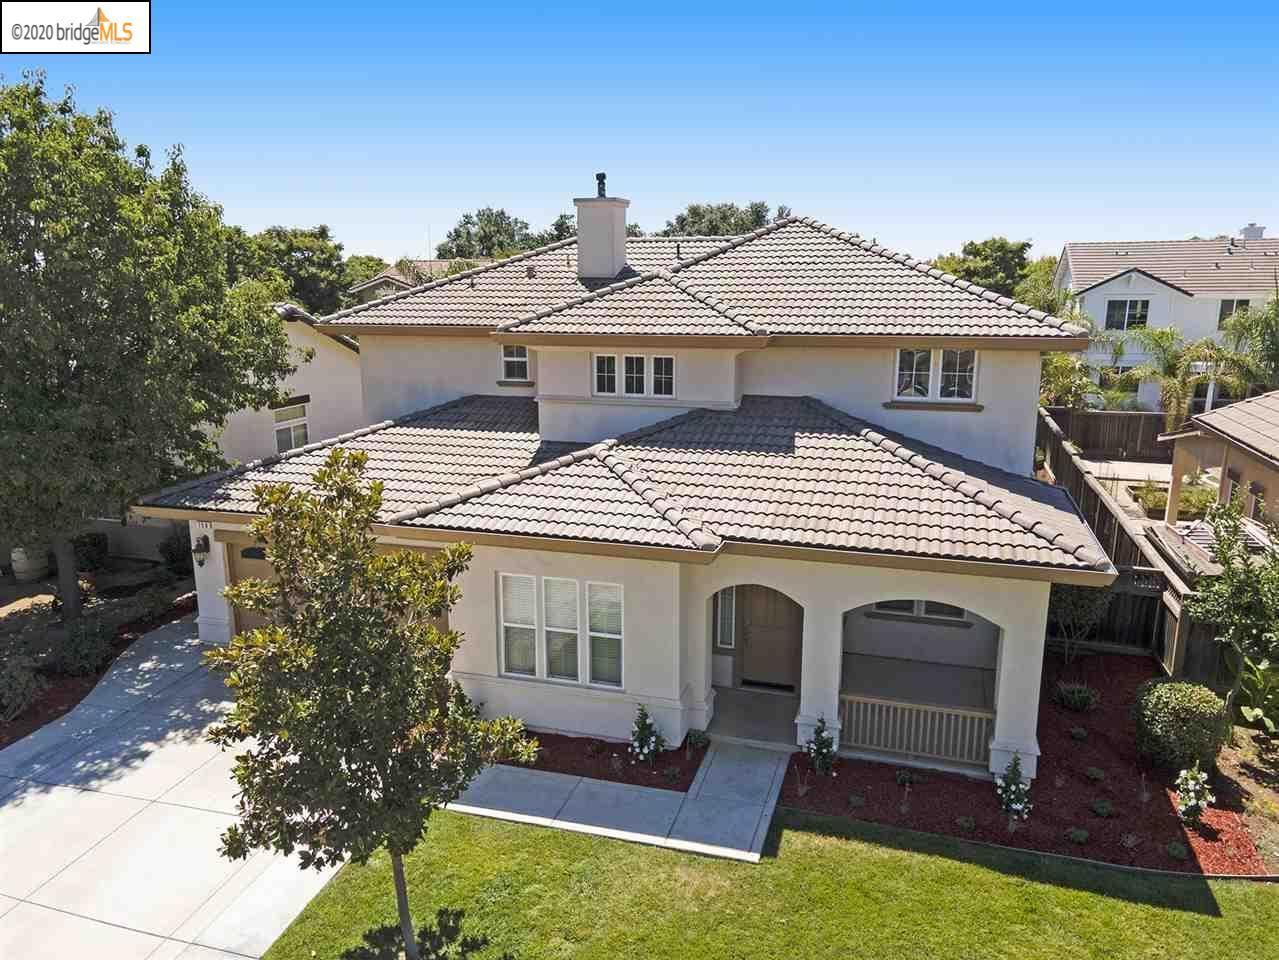 Photo of 758 Jennifer St, BRENTWOOD, CA 94513 (MLS # 40915892)